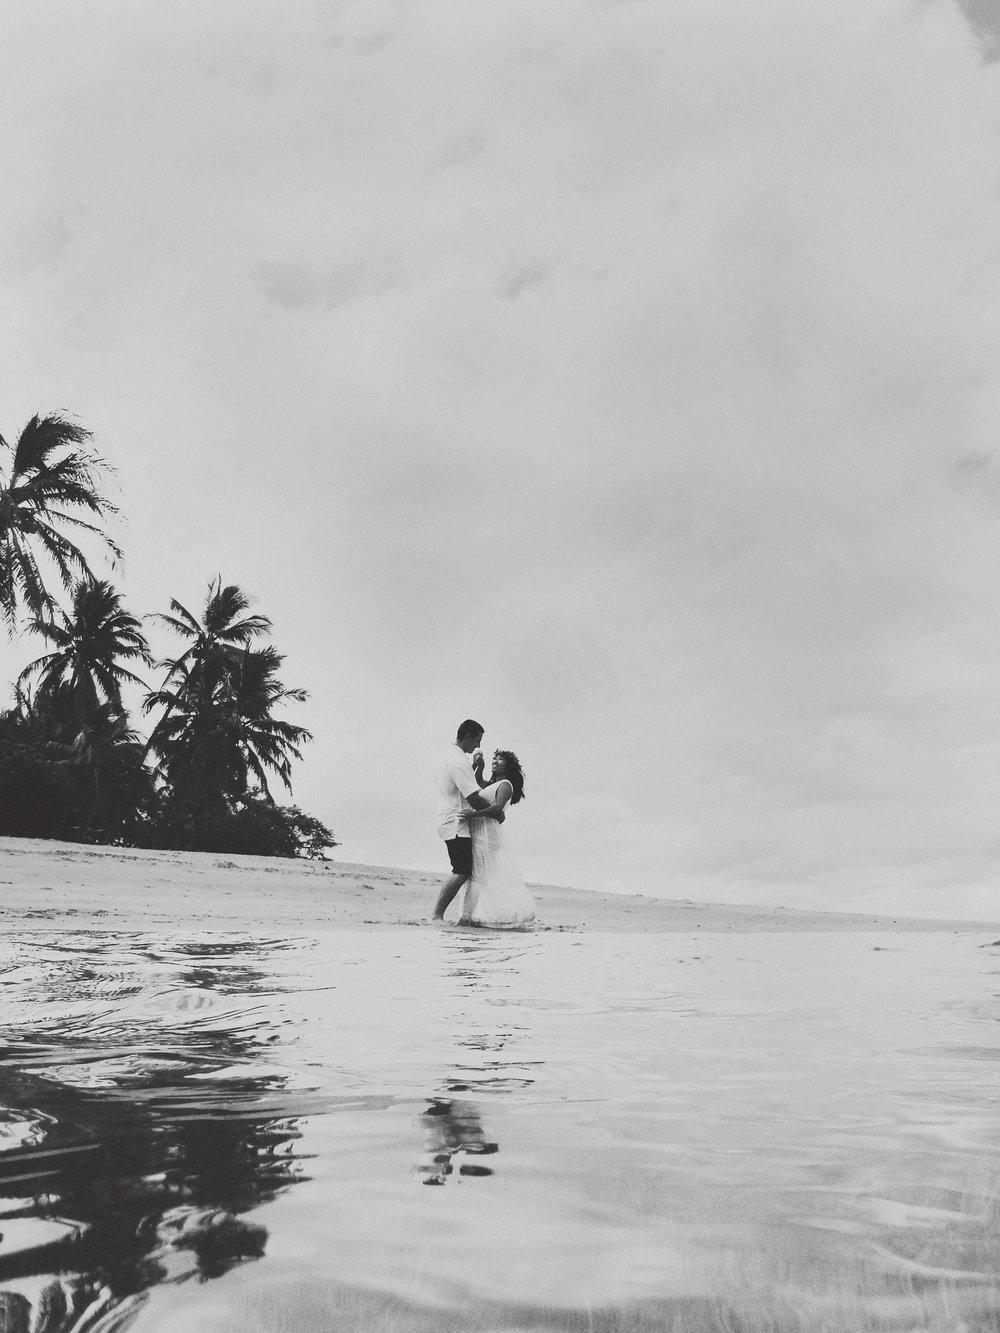 angie-diaz-photography-maui-maternity-lahaina-baby-beach-22.jpg